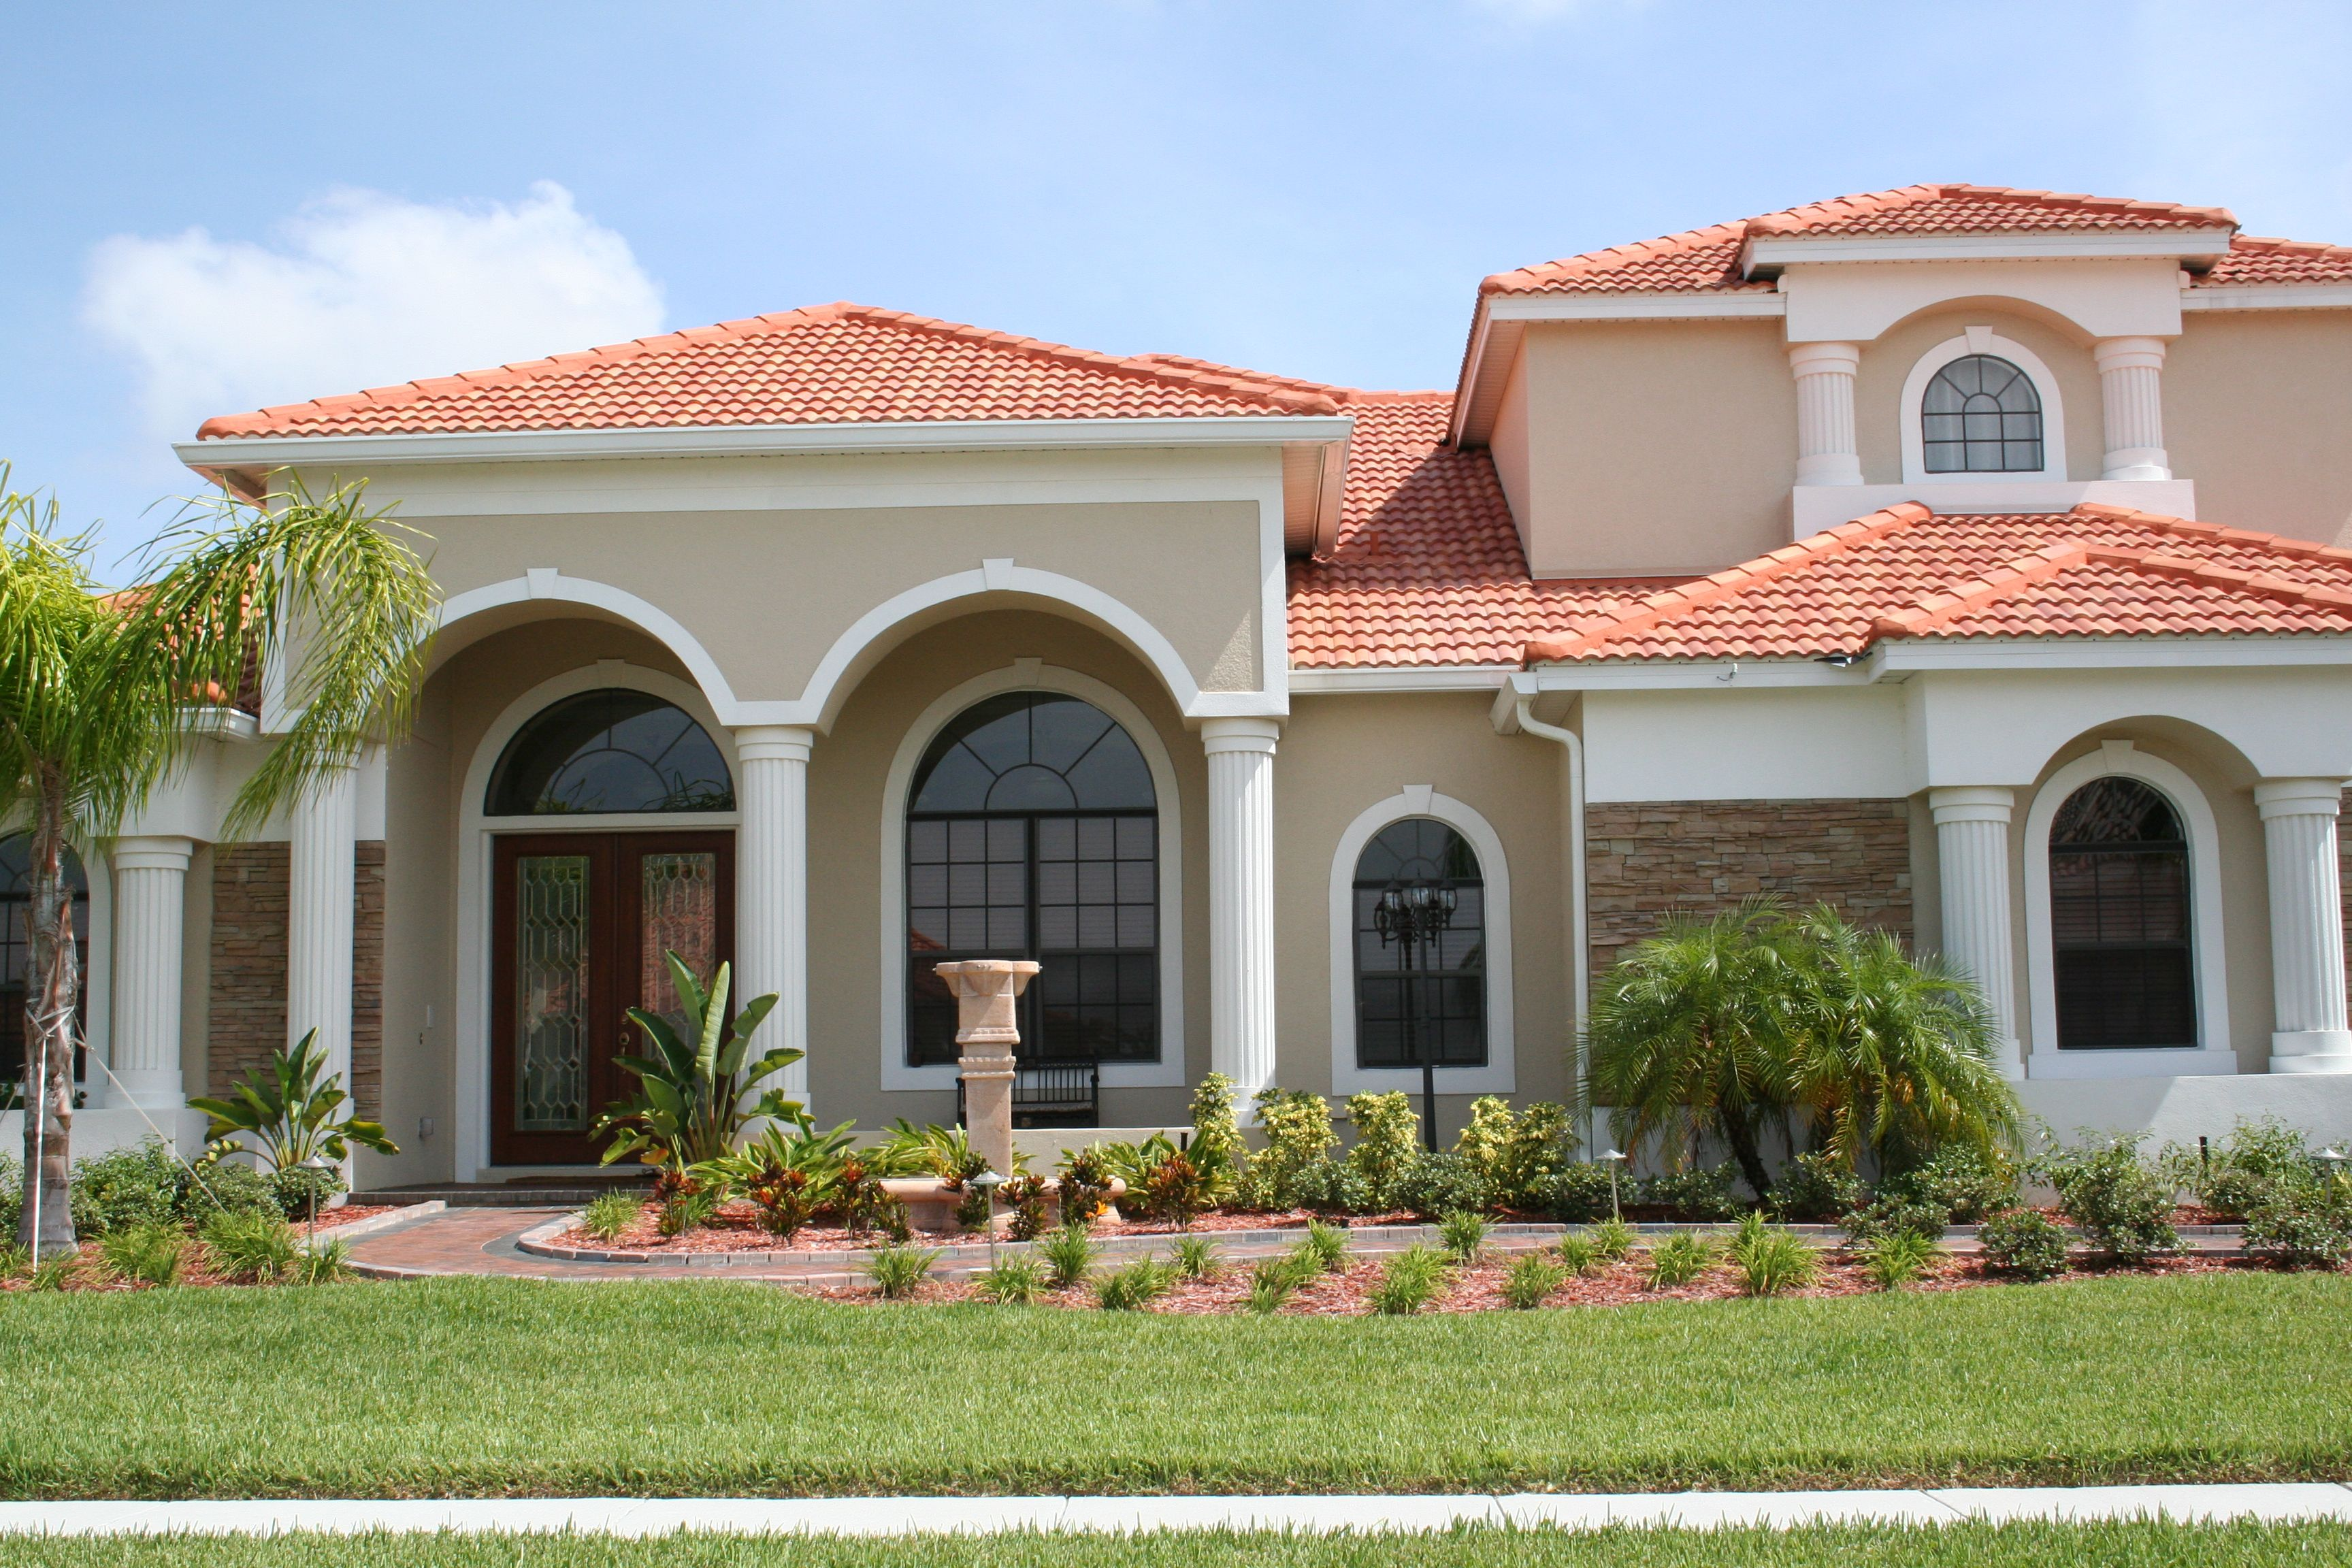 Custom Architectural Foam And Precast Mediterranean House Designs Stucco House Colors Facade House